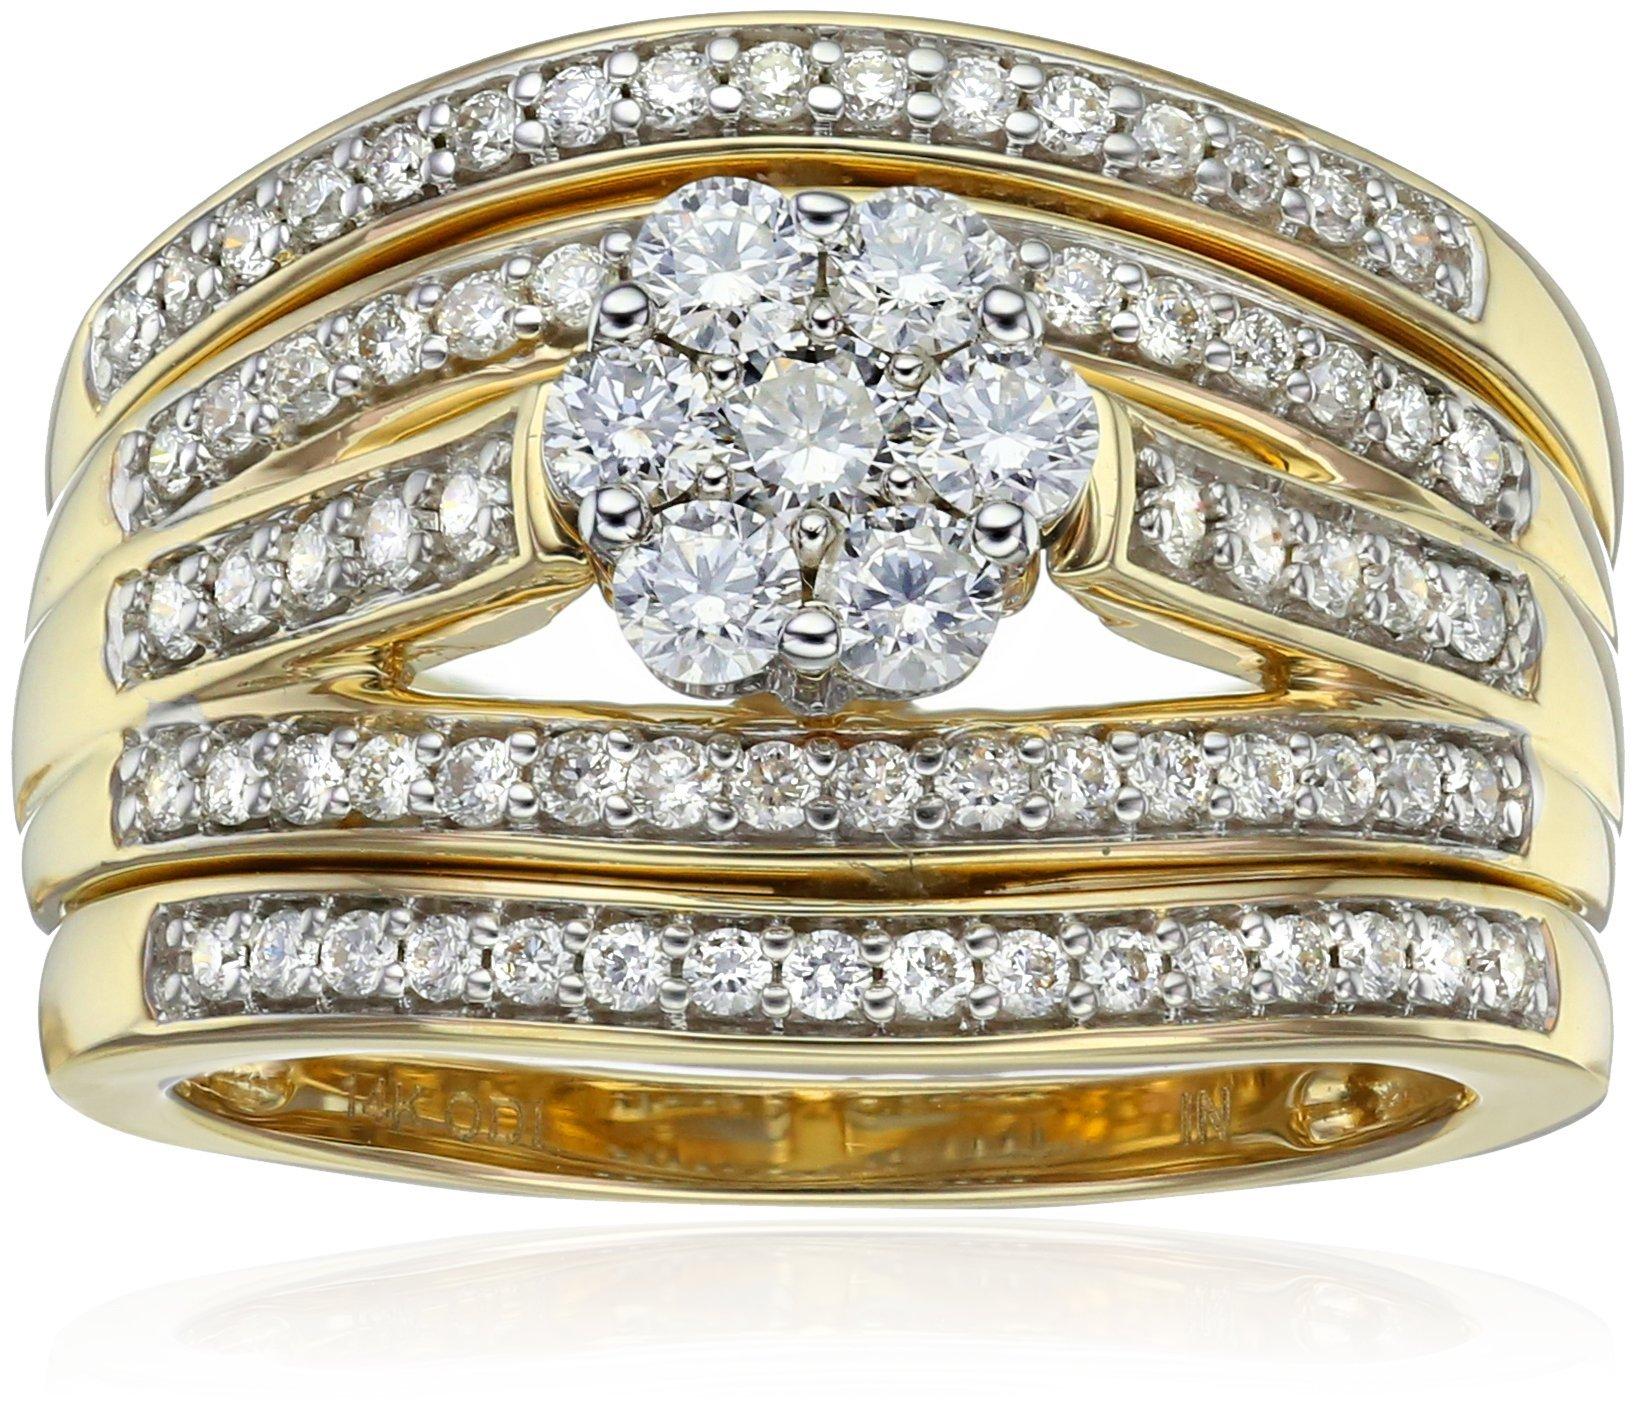 IGI Certified 14k Yellow Gold Diamond Cluster Bridal Set of 3 Wedding Ring Set (1cttw,H-I Color,I1-I2 Clarity), Size 7